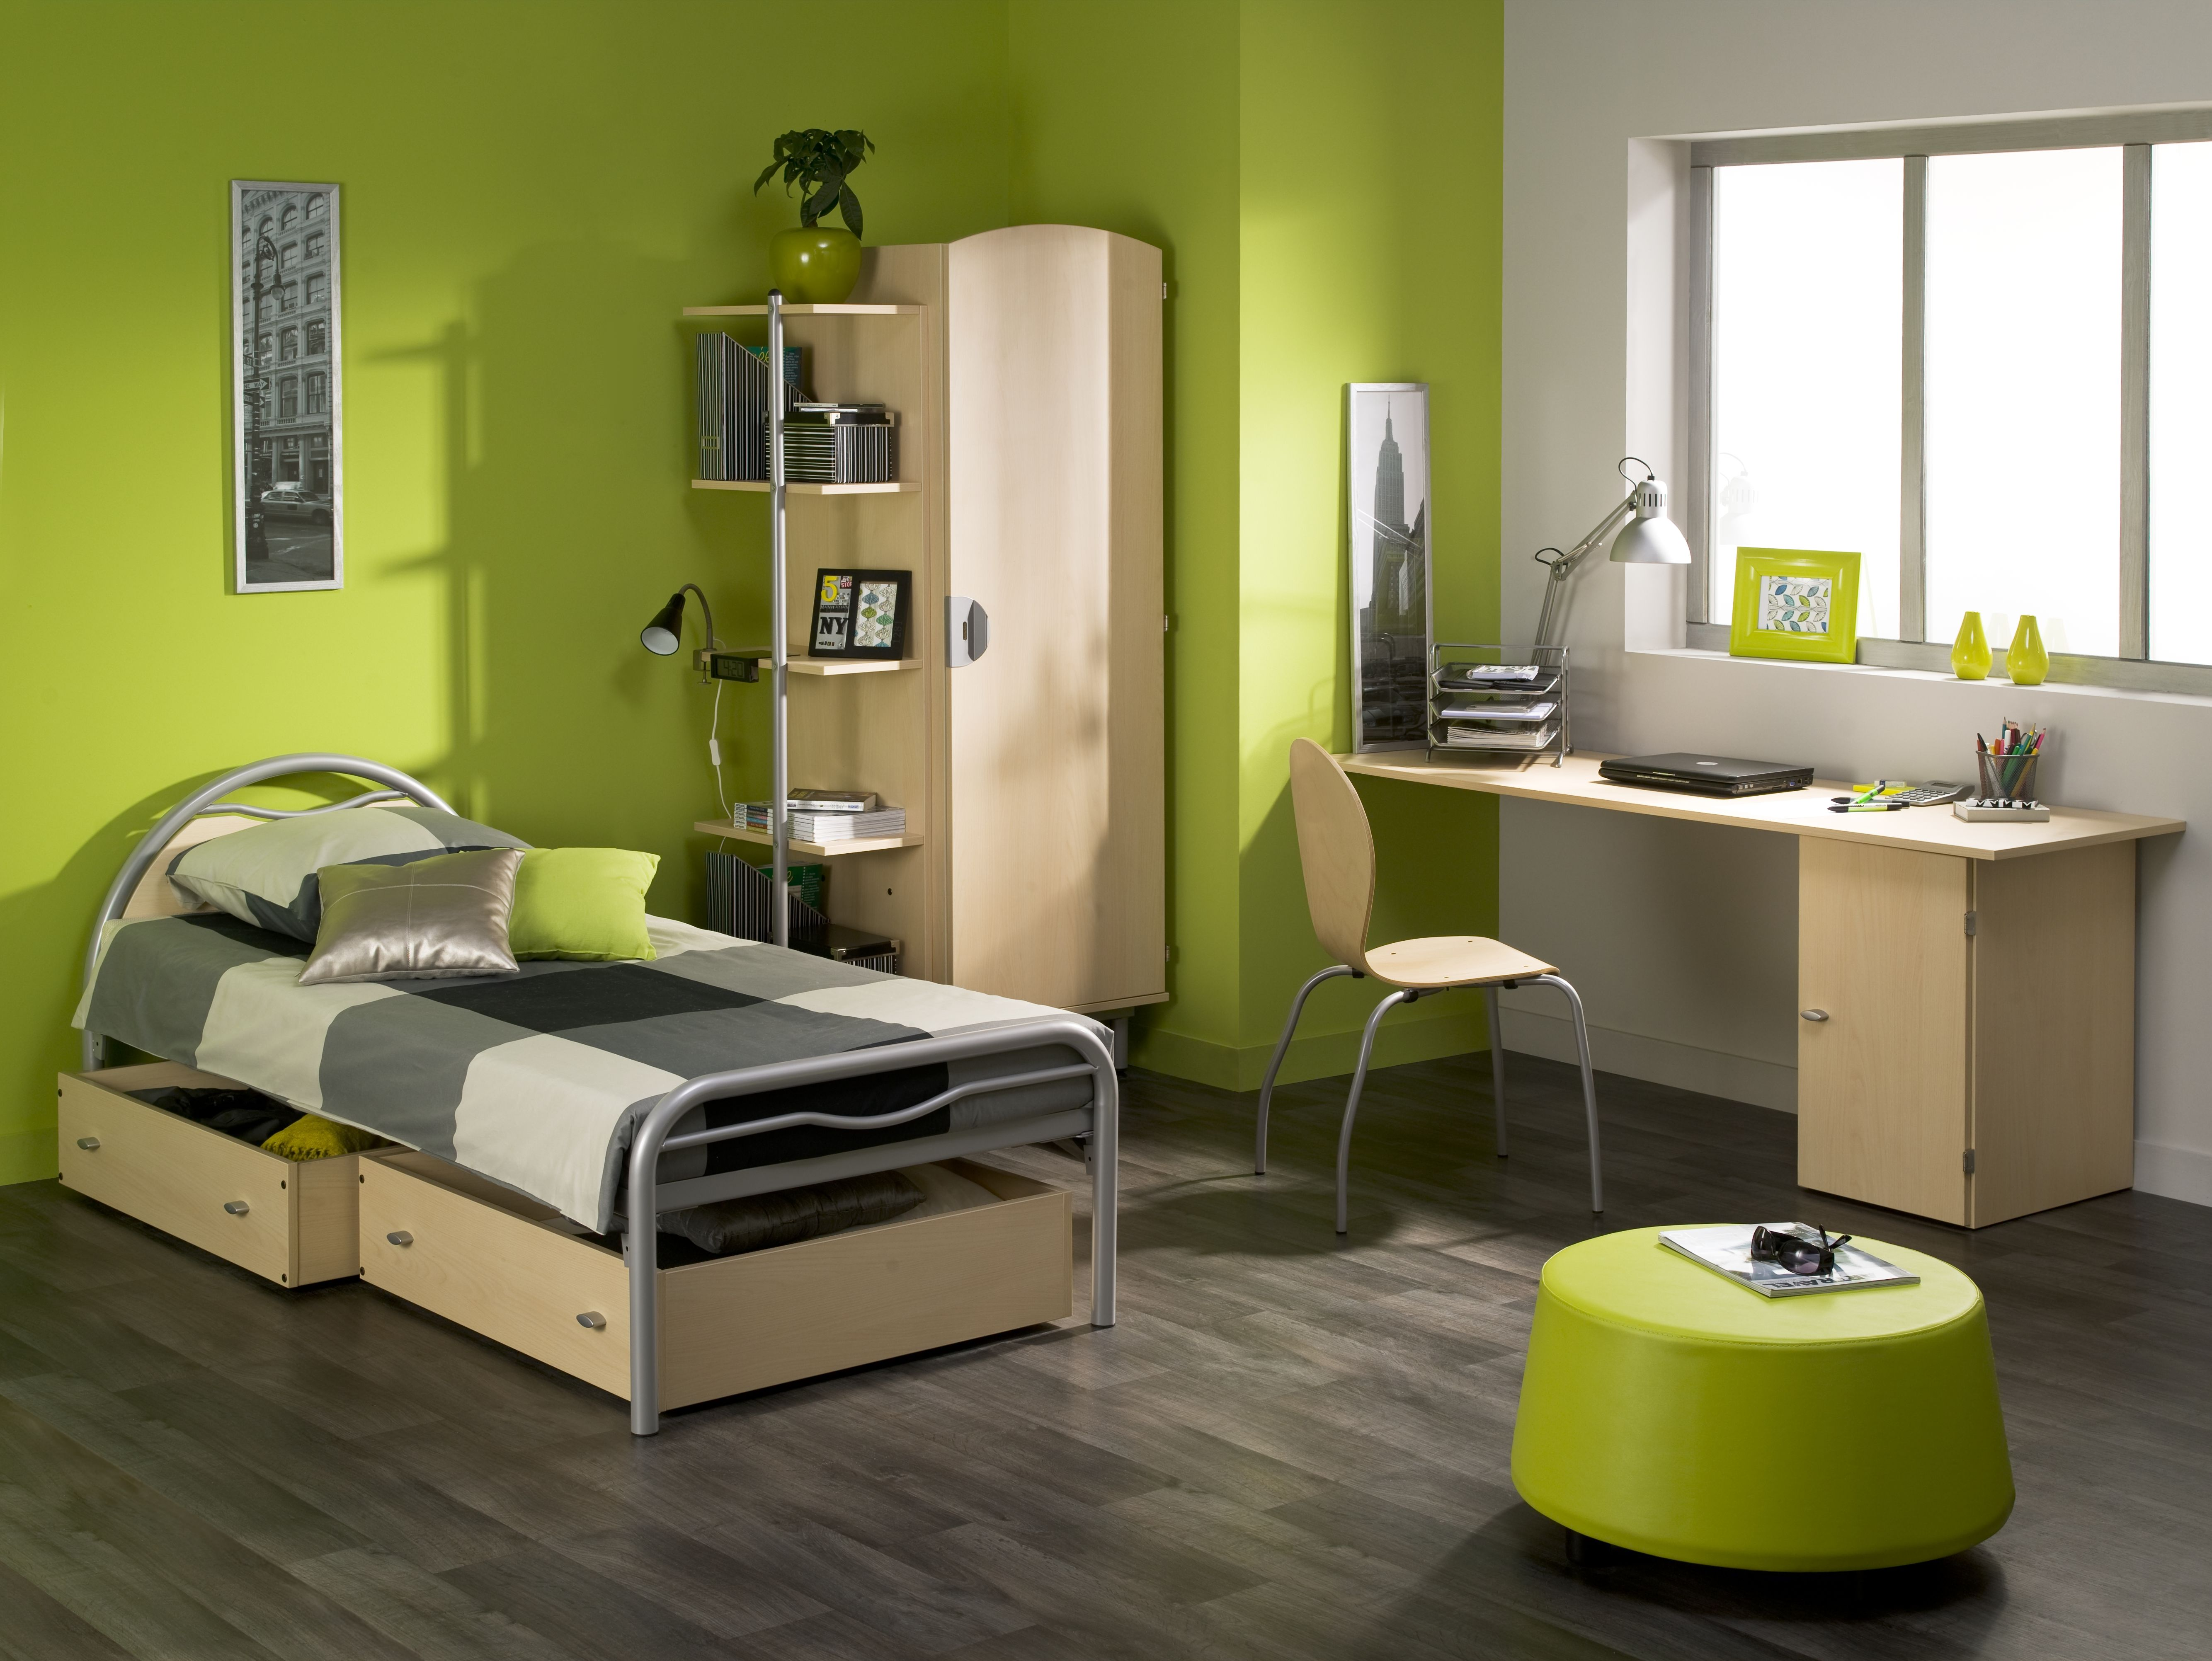 chambre etudiant gamme alba lit bureau rangement lit chambre internat litsuperpose. Black Bedroom Furniture Sets. Home Design Ideas